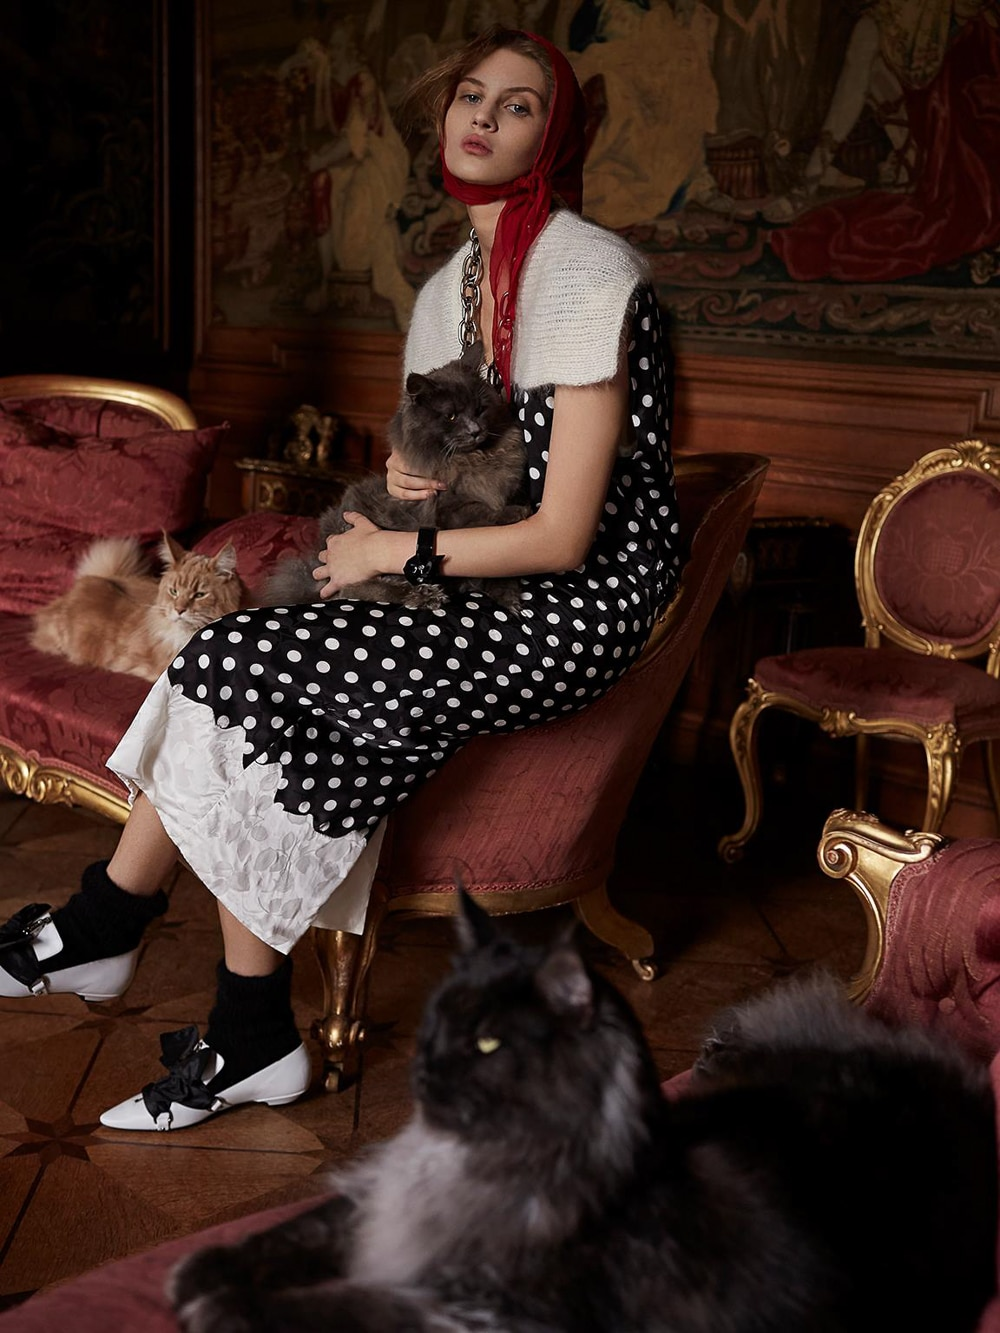 Harpers-Bazaar-UK-Septamber-2018-Florence-Kosky-Agata-Pospieszynska-11.jpg